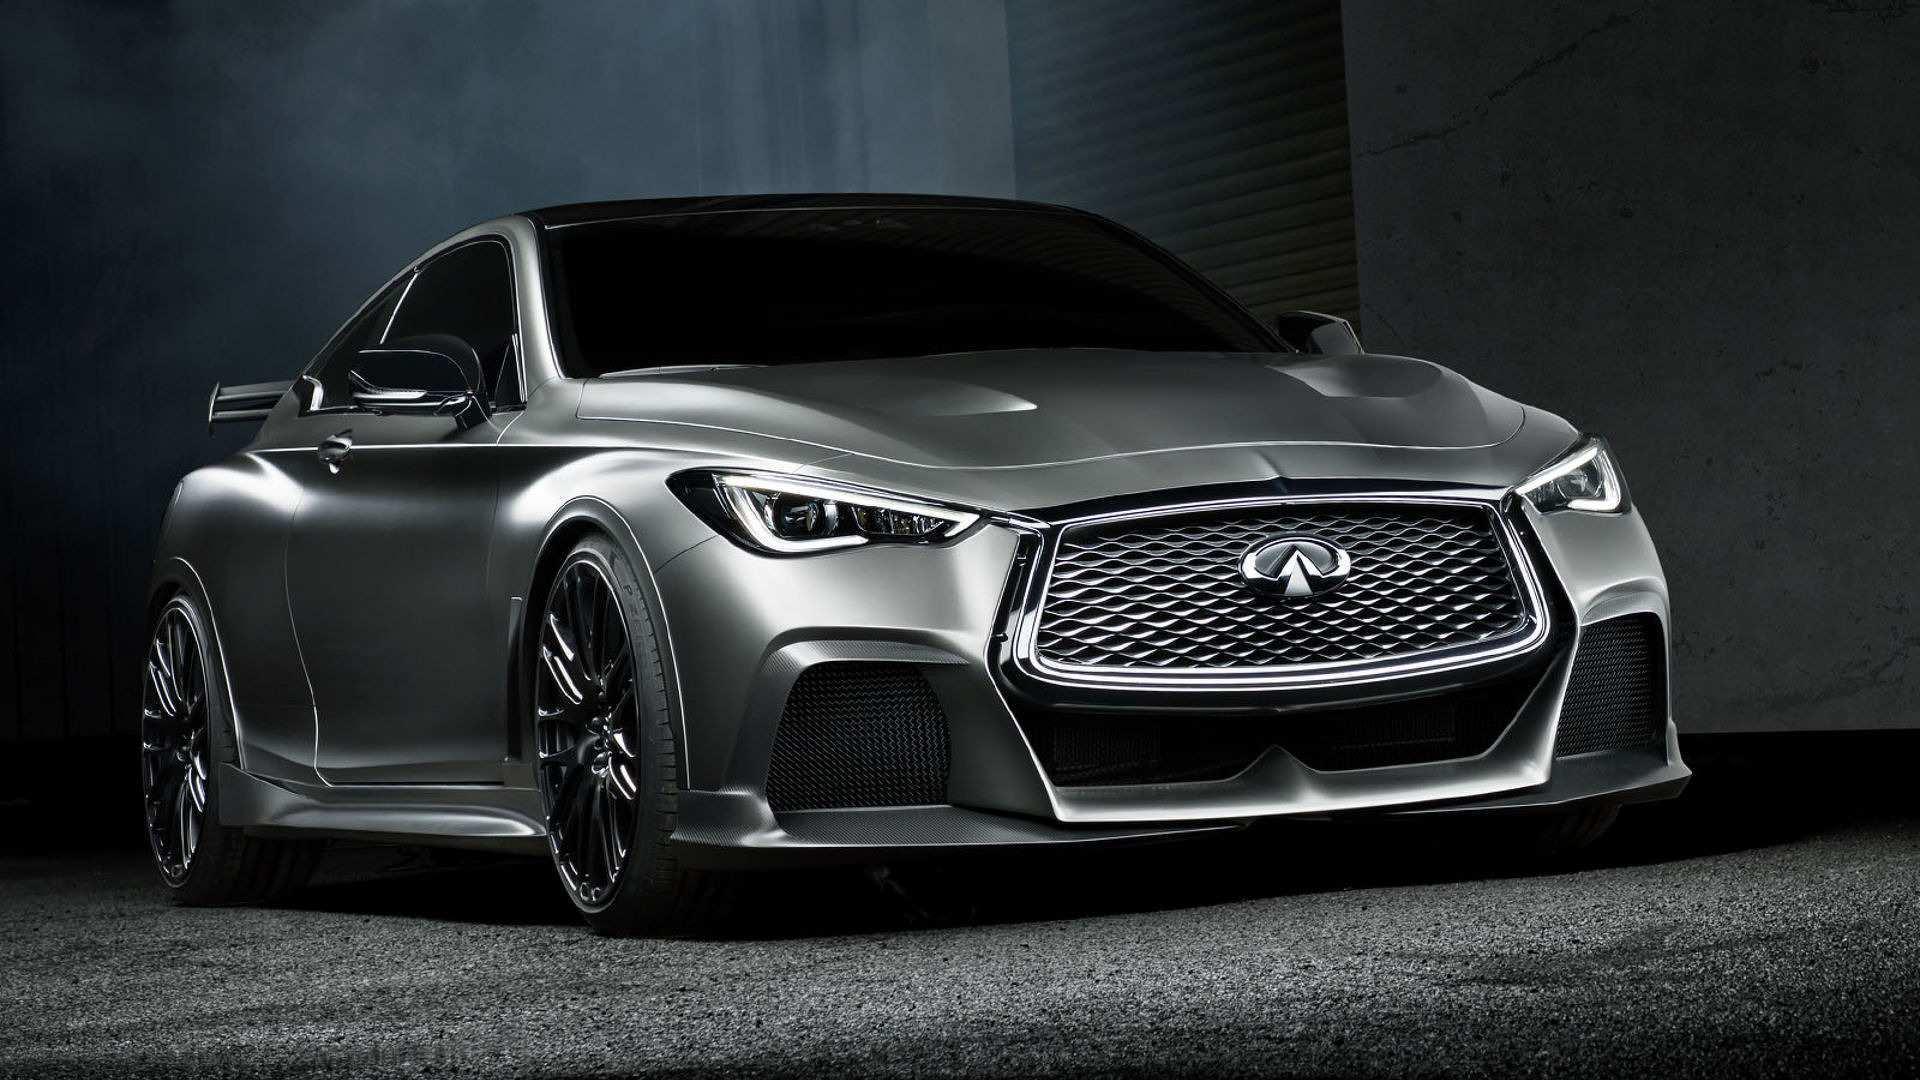 41 All New 2020 Infiniti Q60 Black S New Review for 2020 Infiniti Q60 Black S